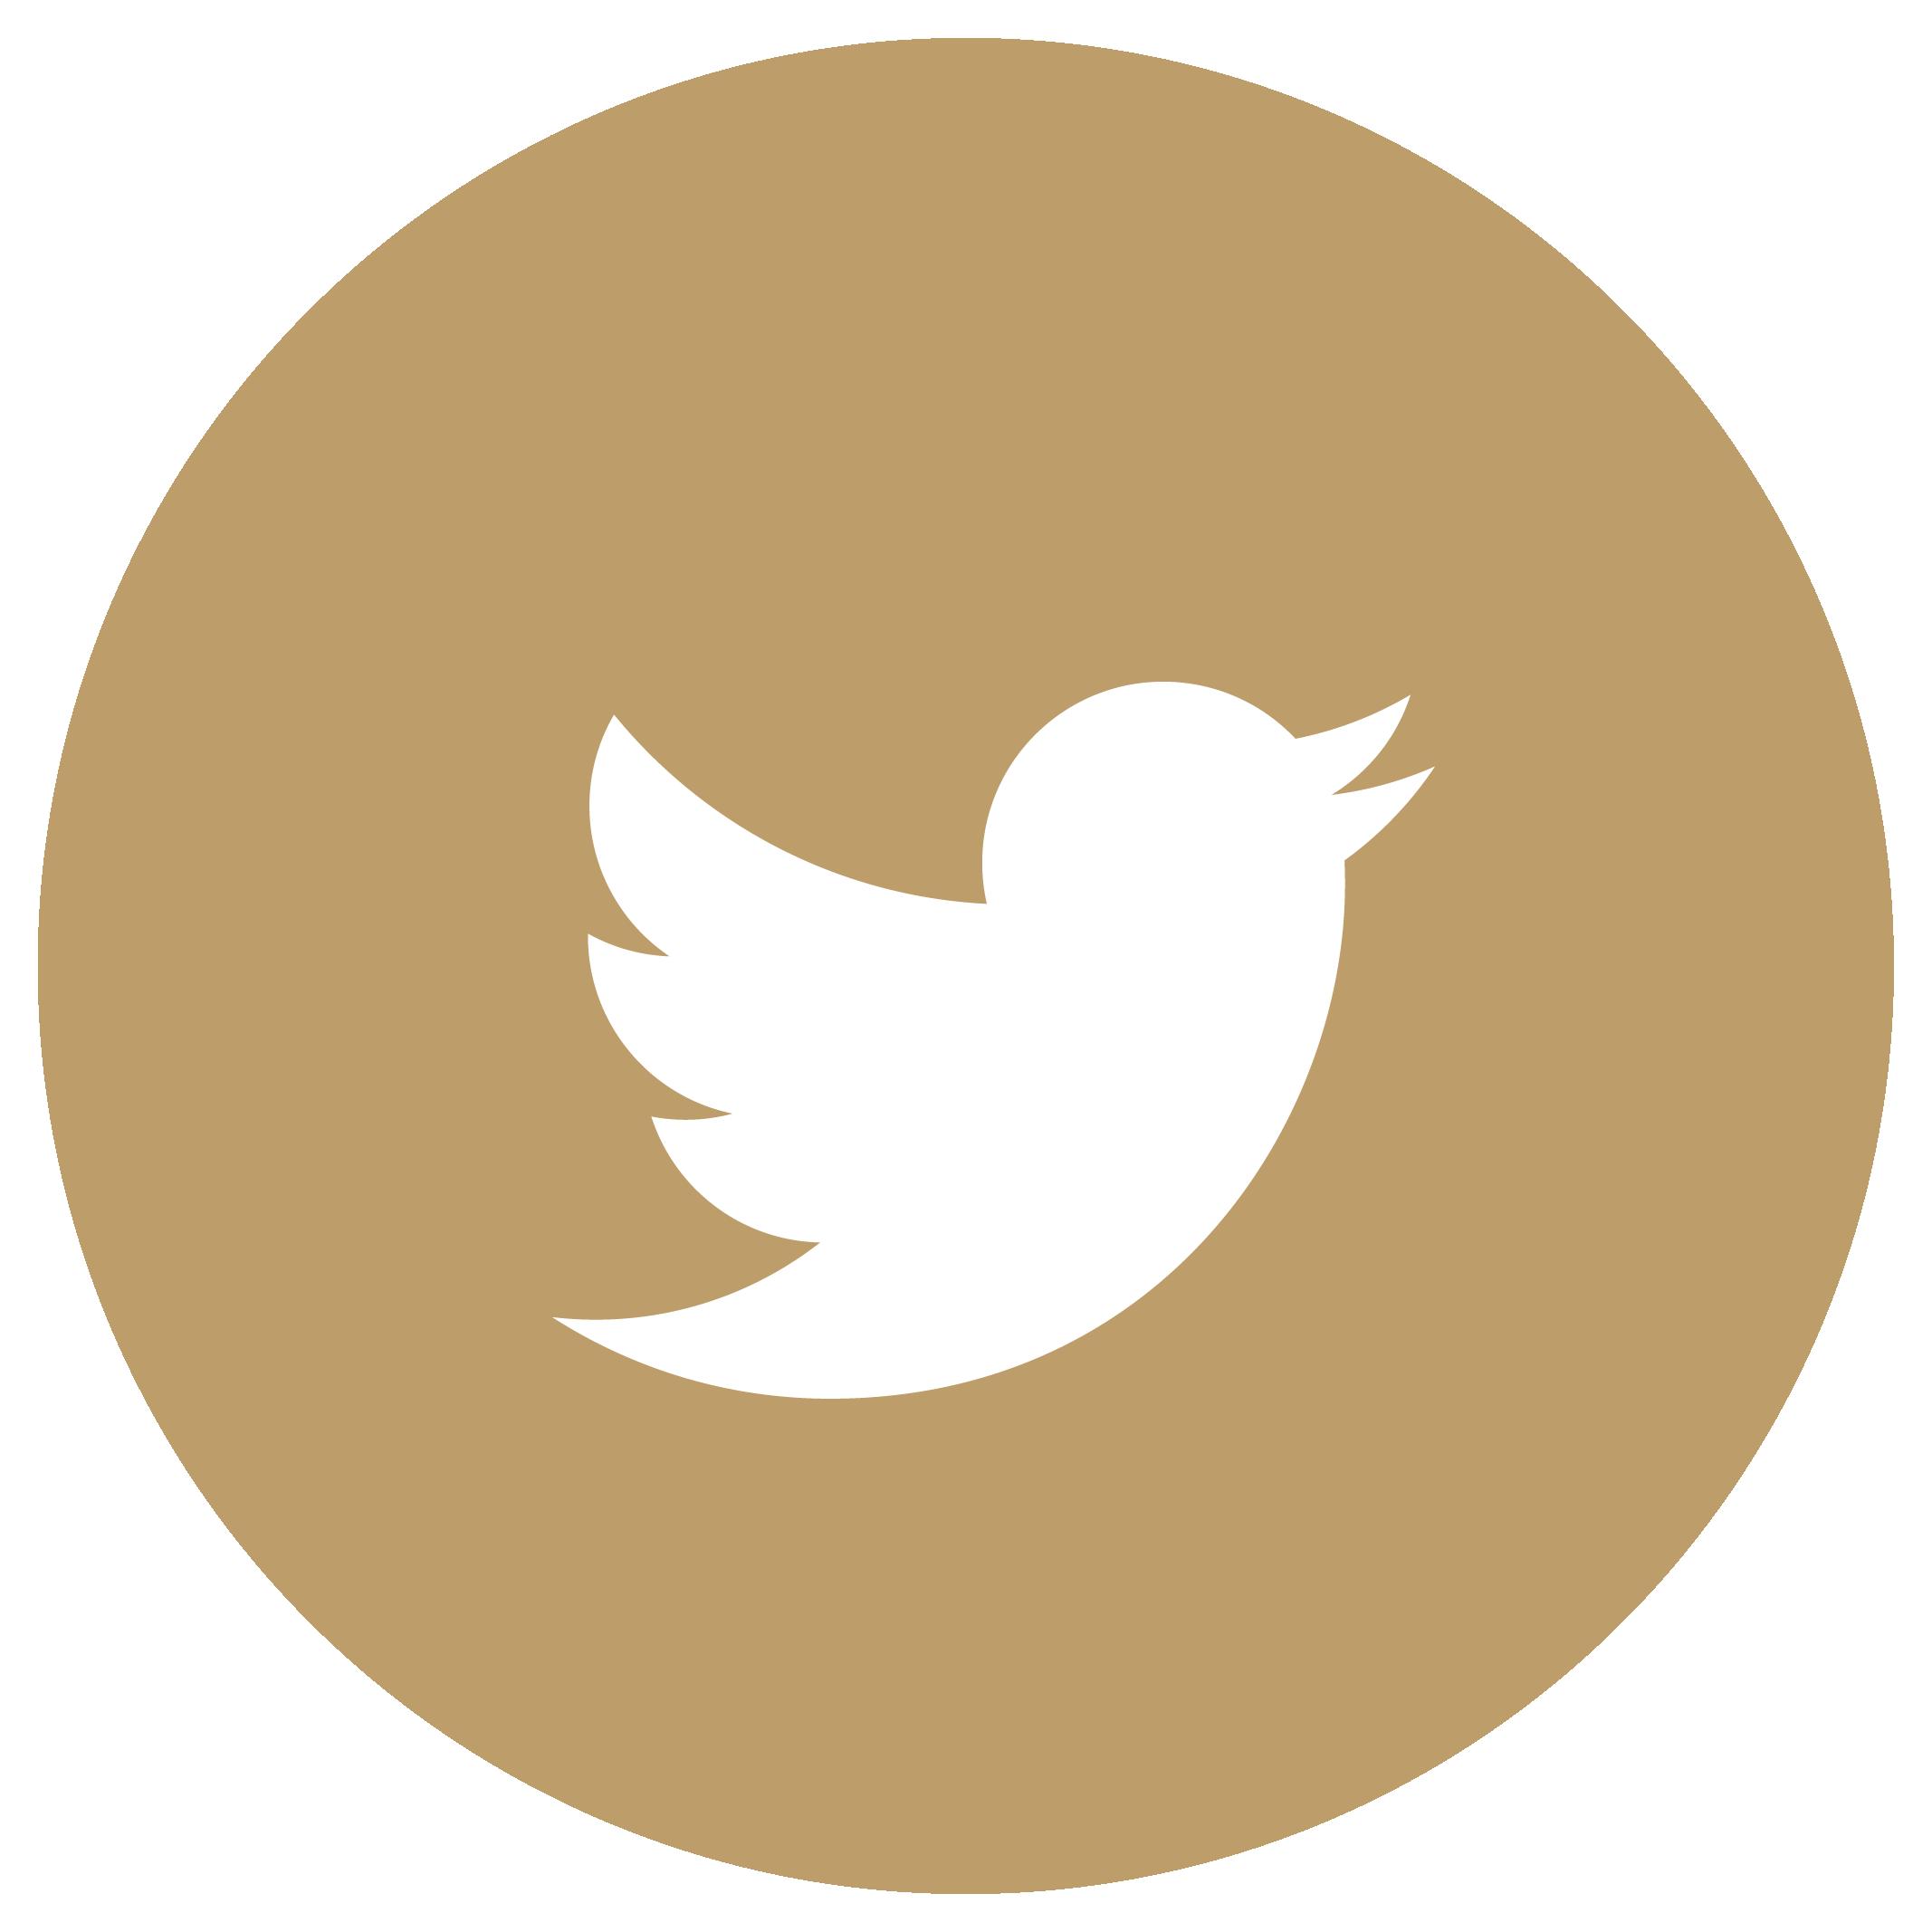 Icoon Twitter